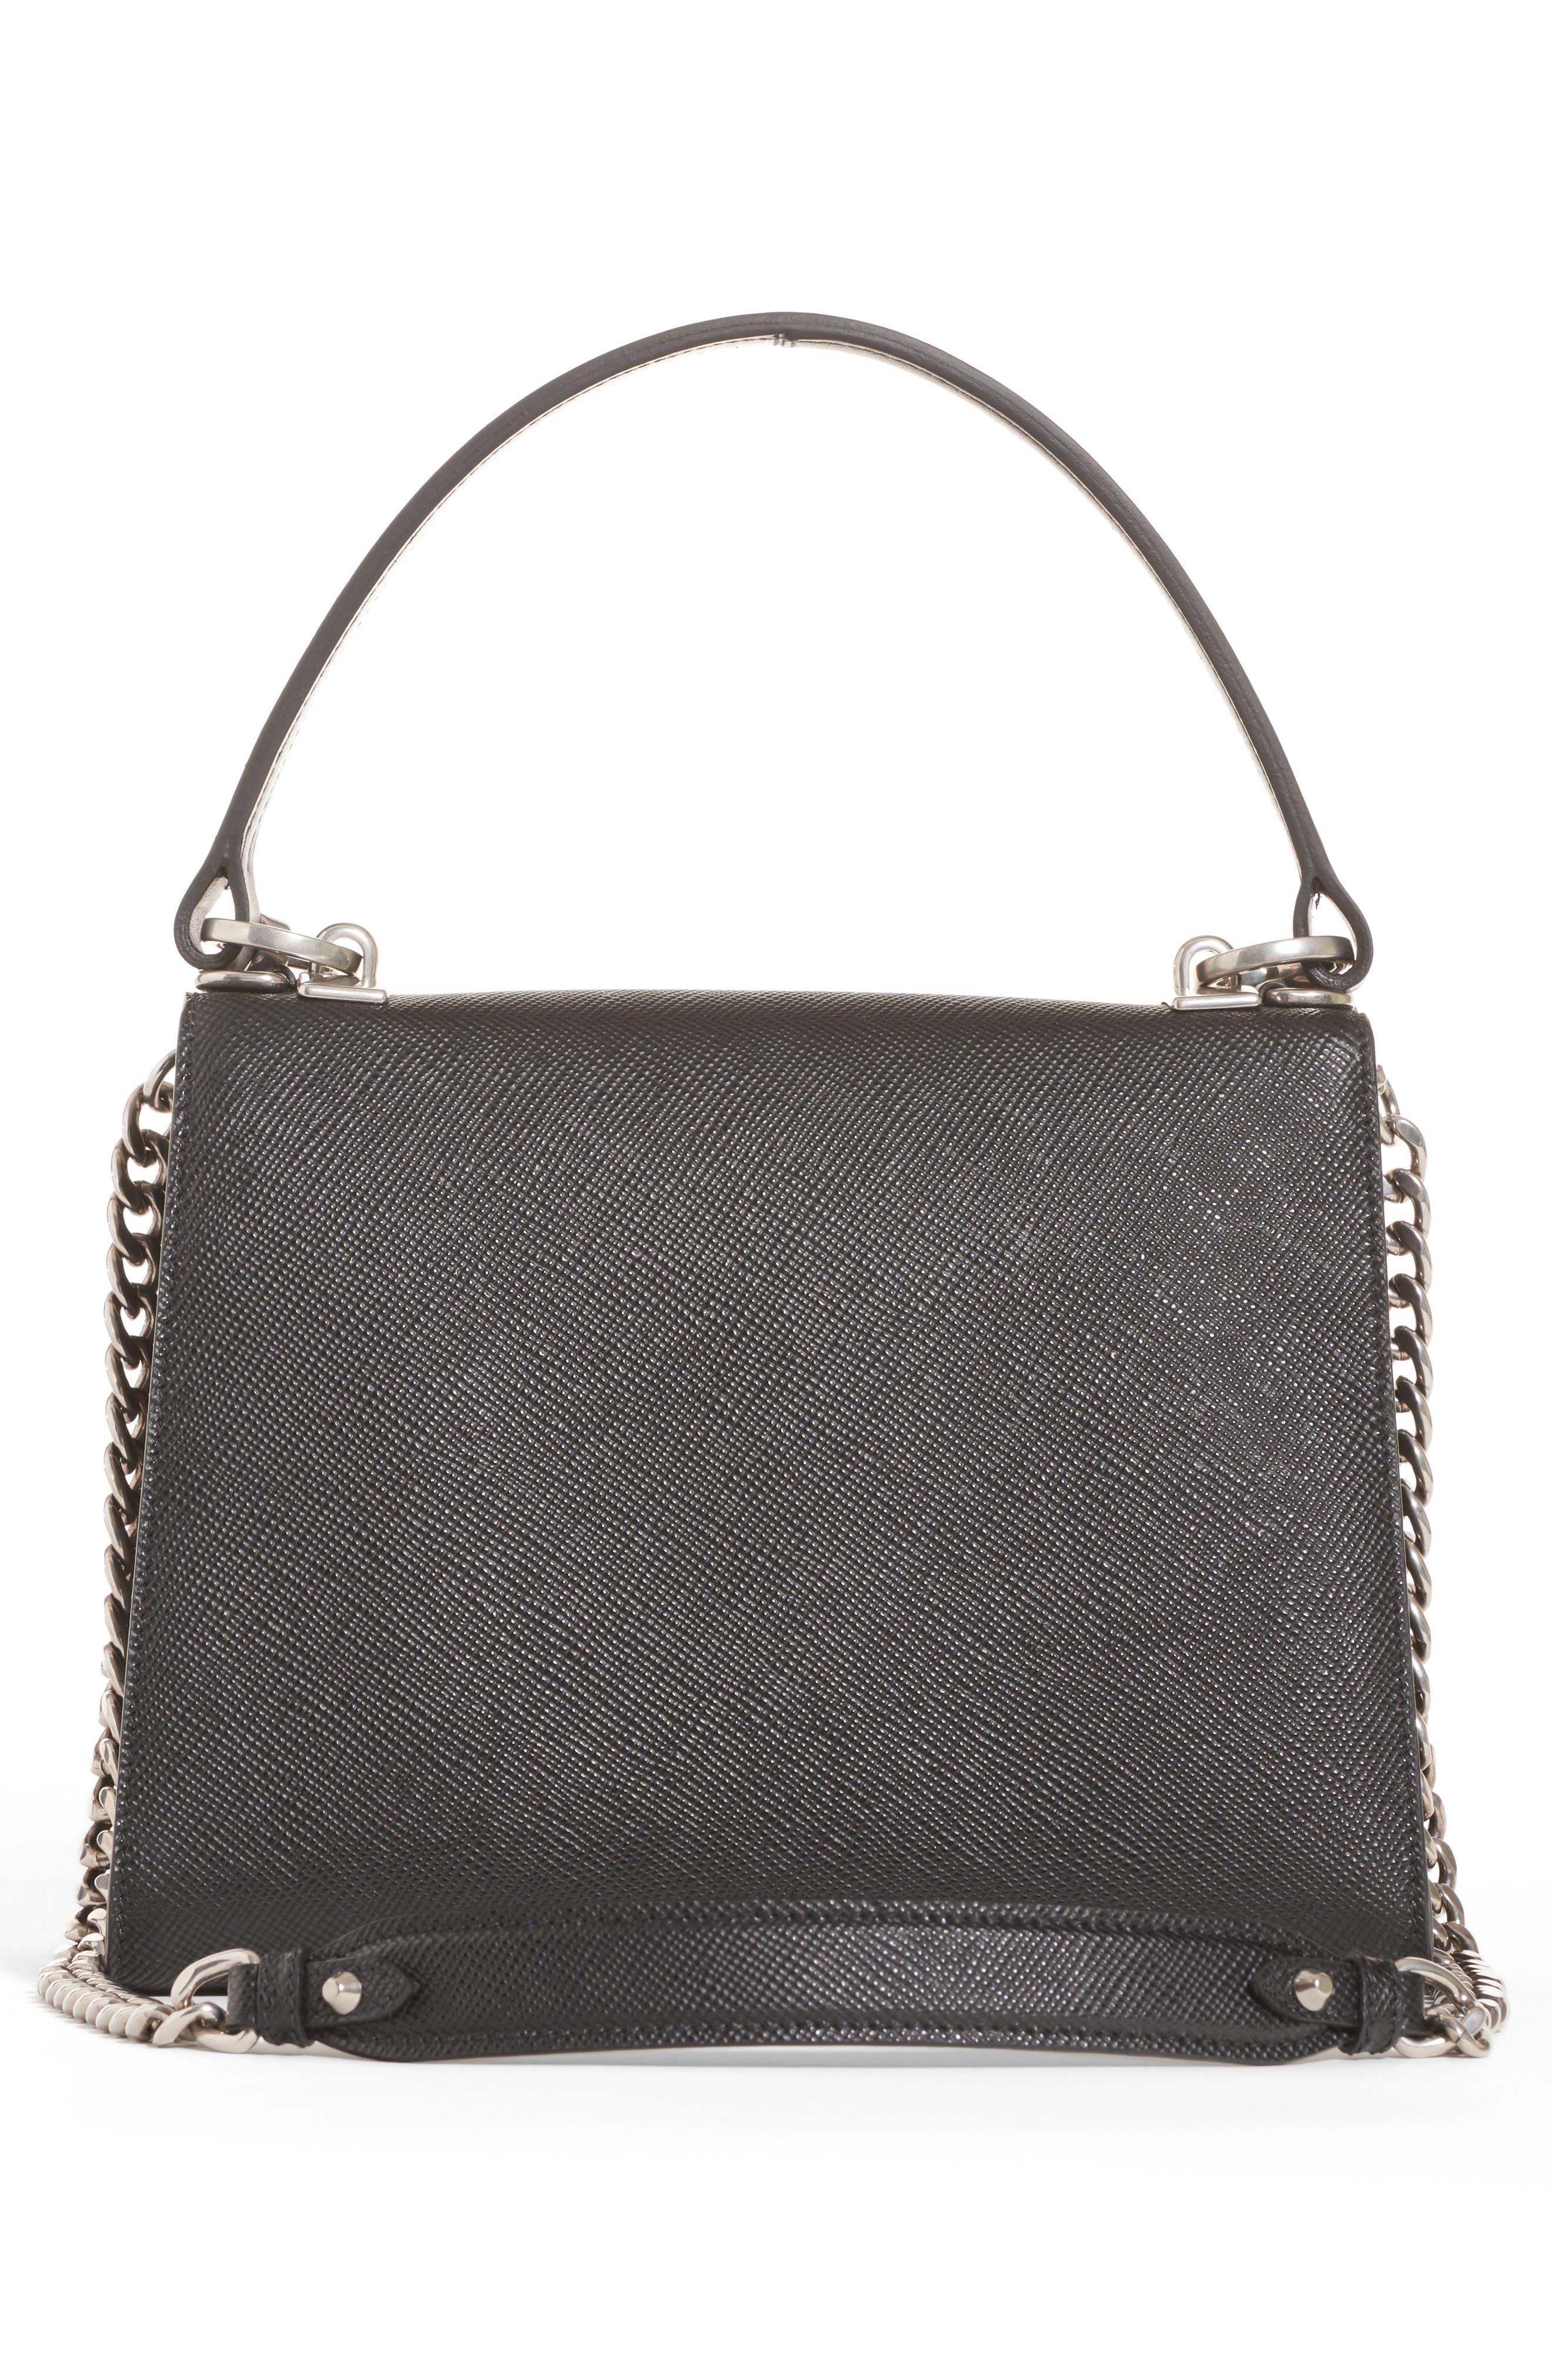 Monochrome Logo Top Handle Leather Handbag,                             Alternate thumbnail 2, color,                             NERO